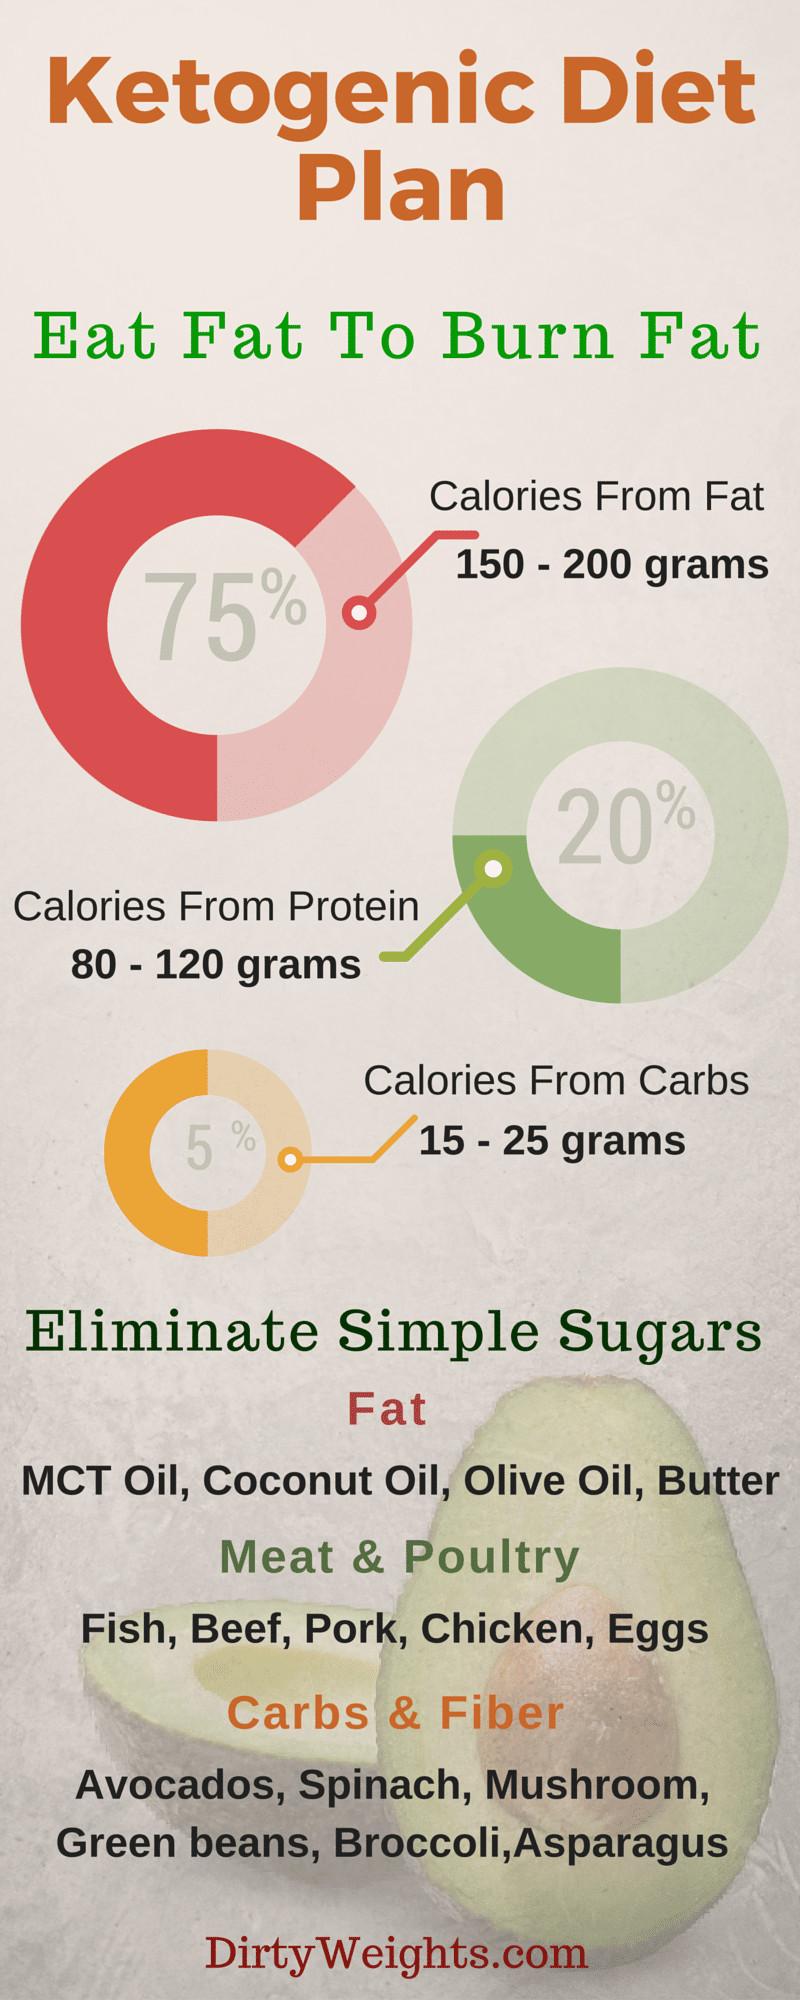 Keto Diet Videos  Ketogenic Diet Weight Loss Results